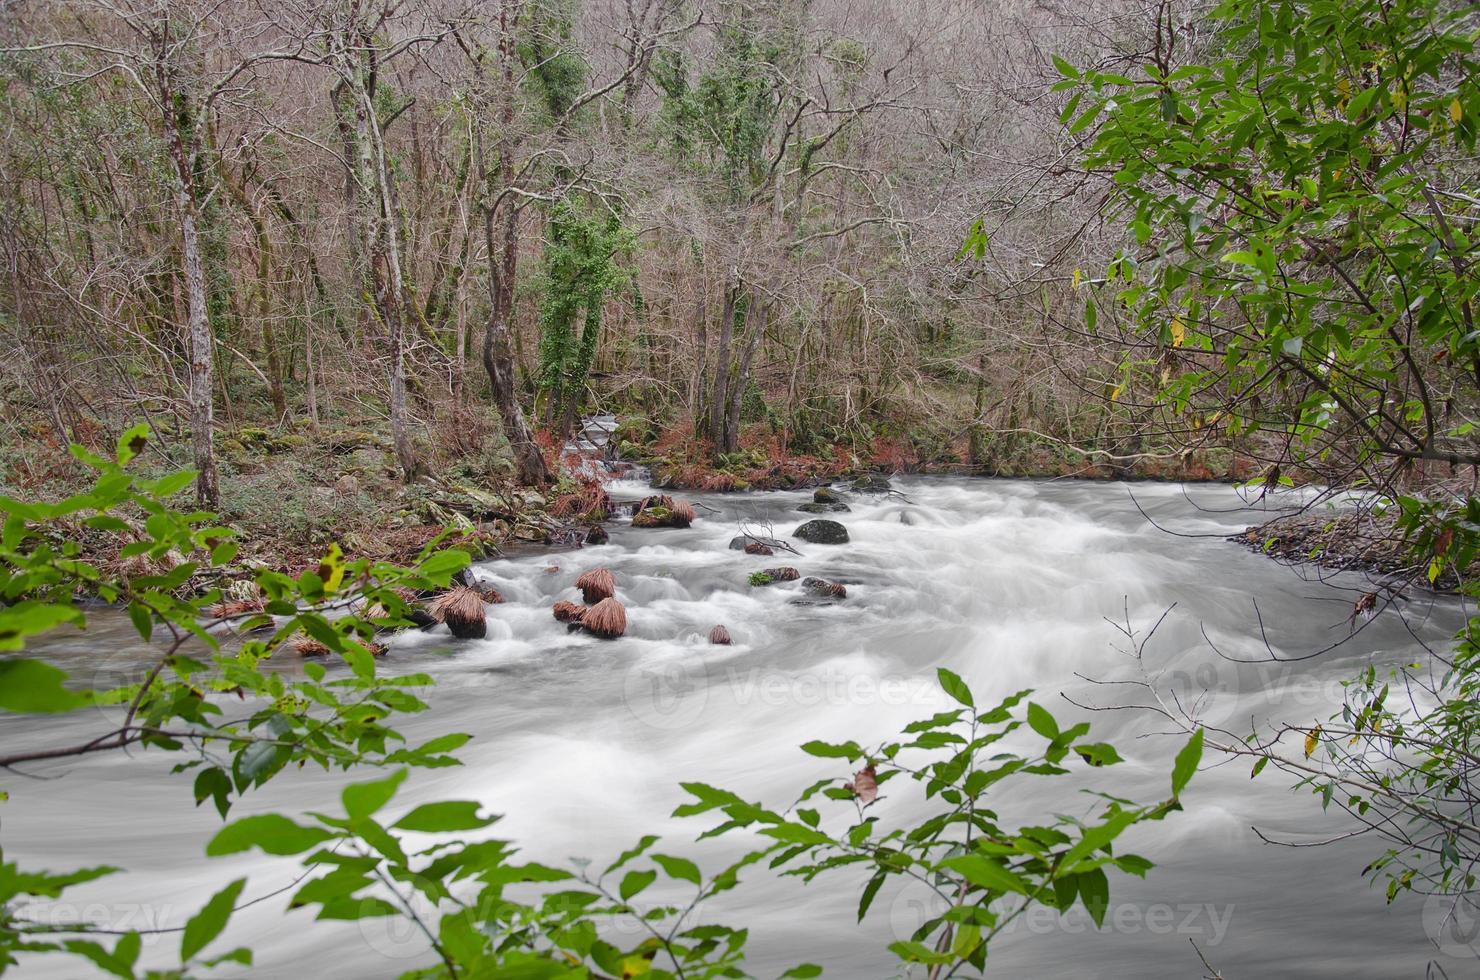 Eume river photo